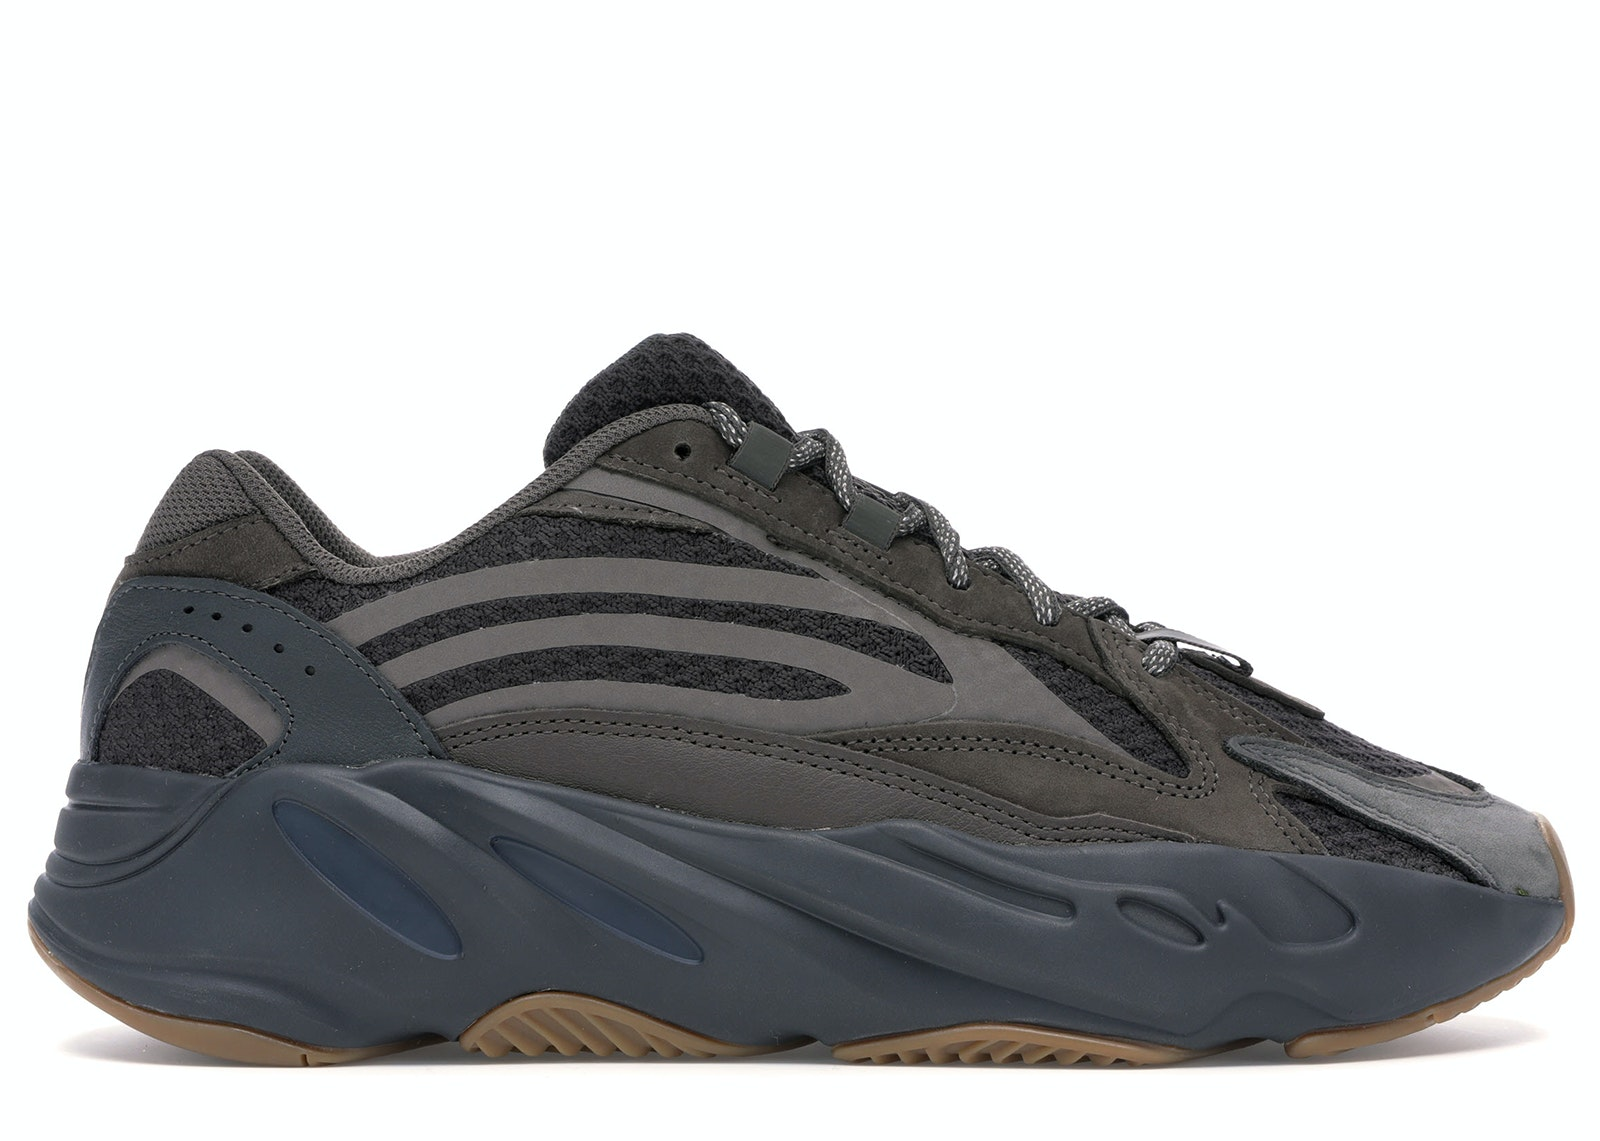 83f61d95a22 adidas Yeezy Boost 750 vs Nike Air Fear of God 1 - Sneaker Bar Detroit